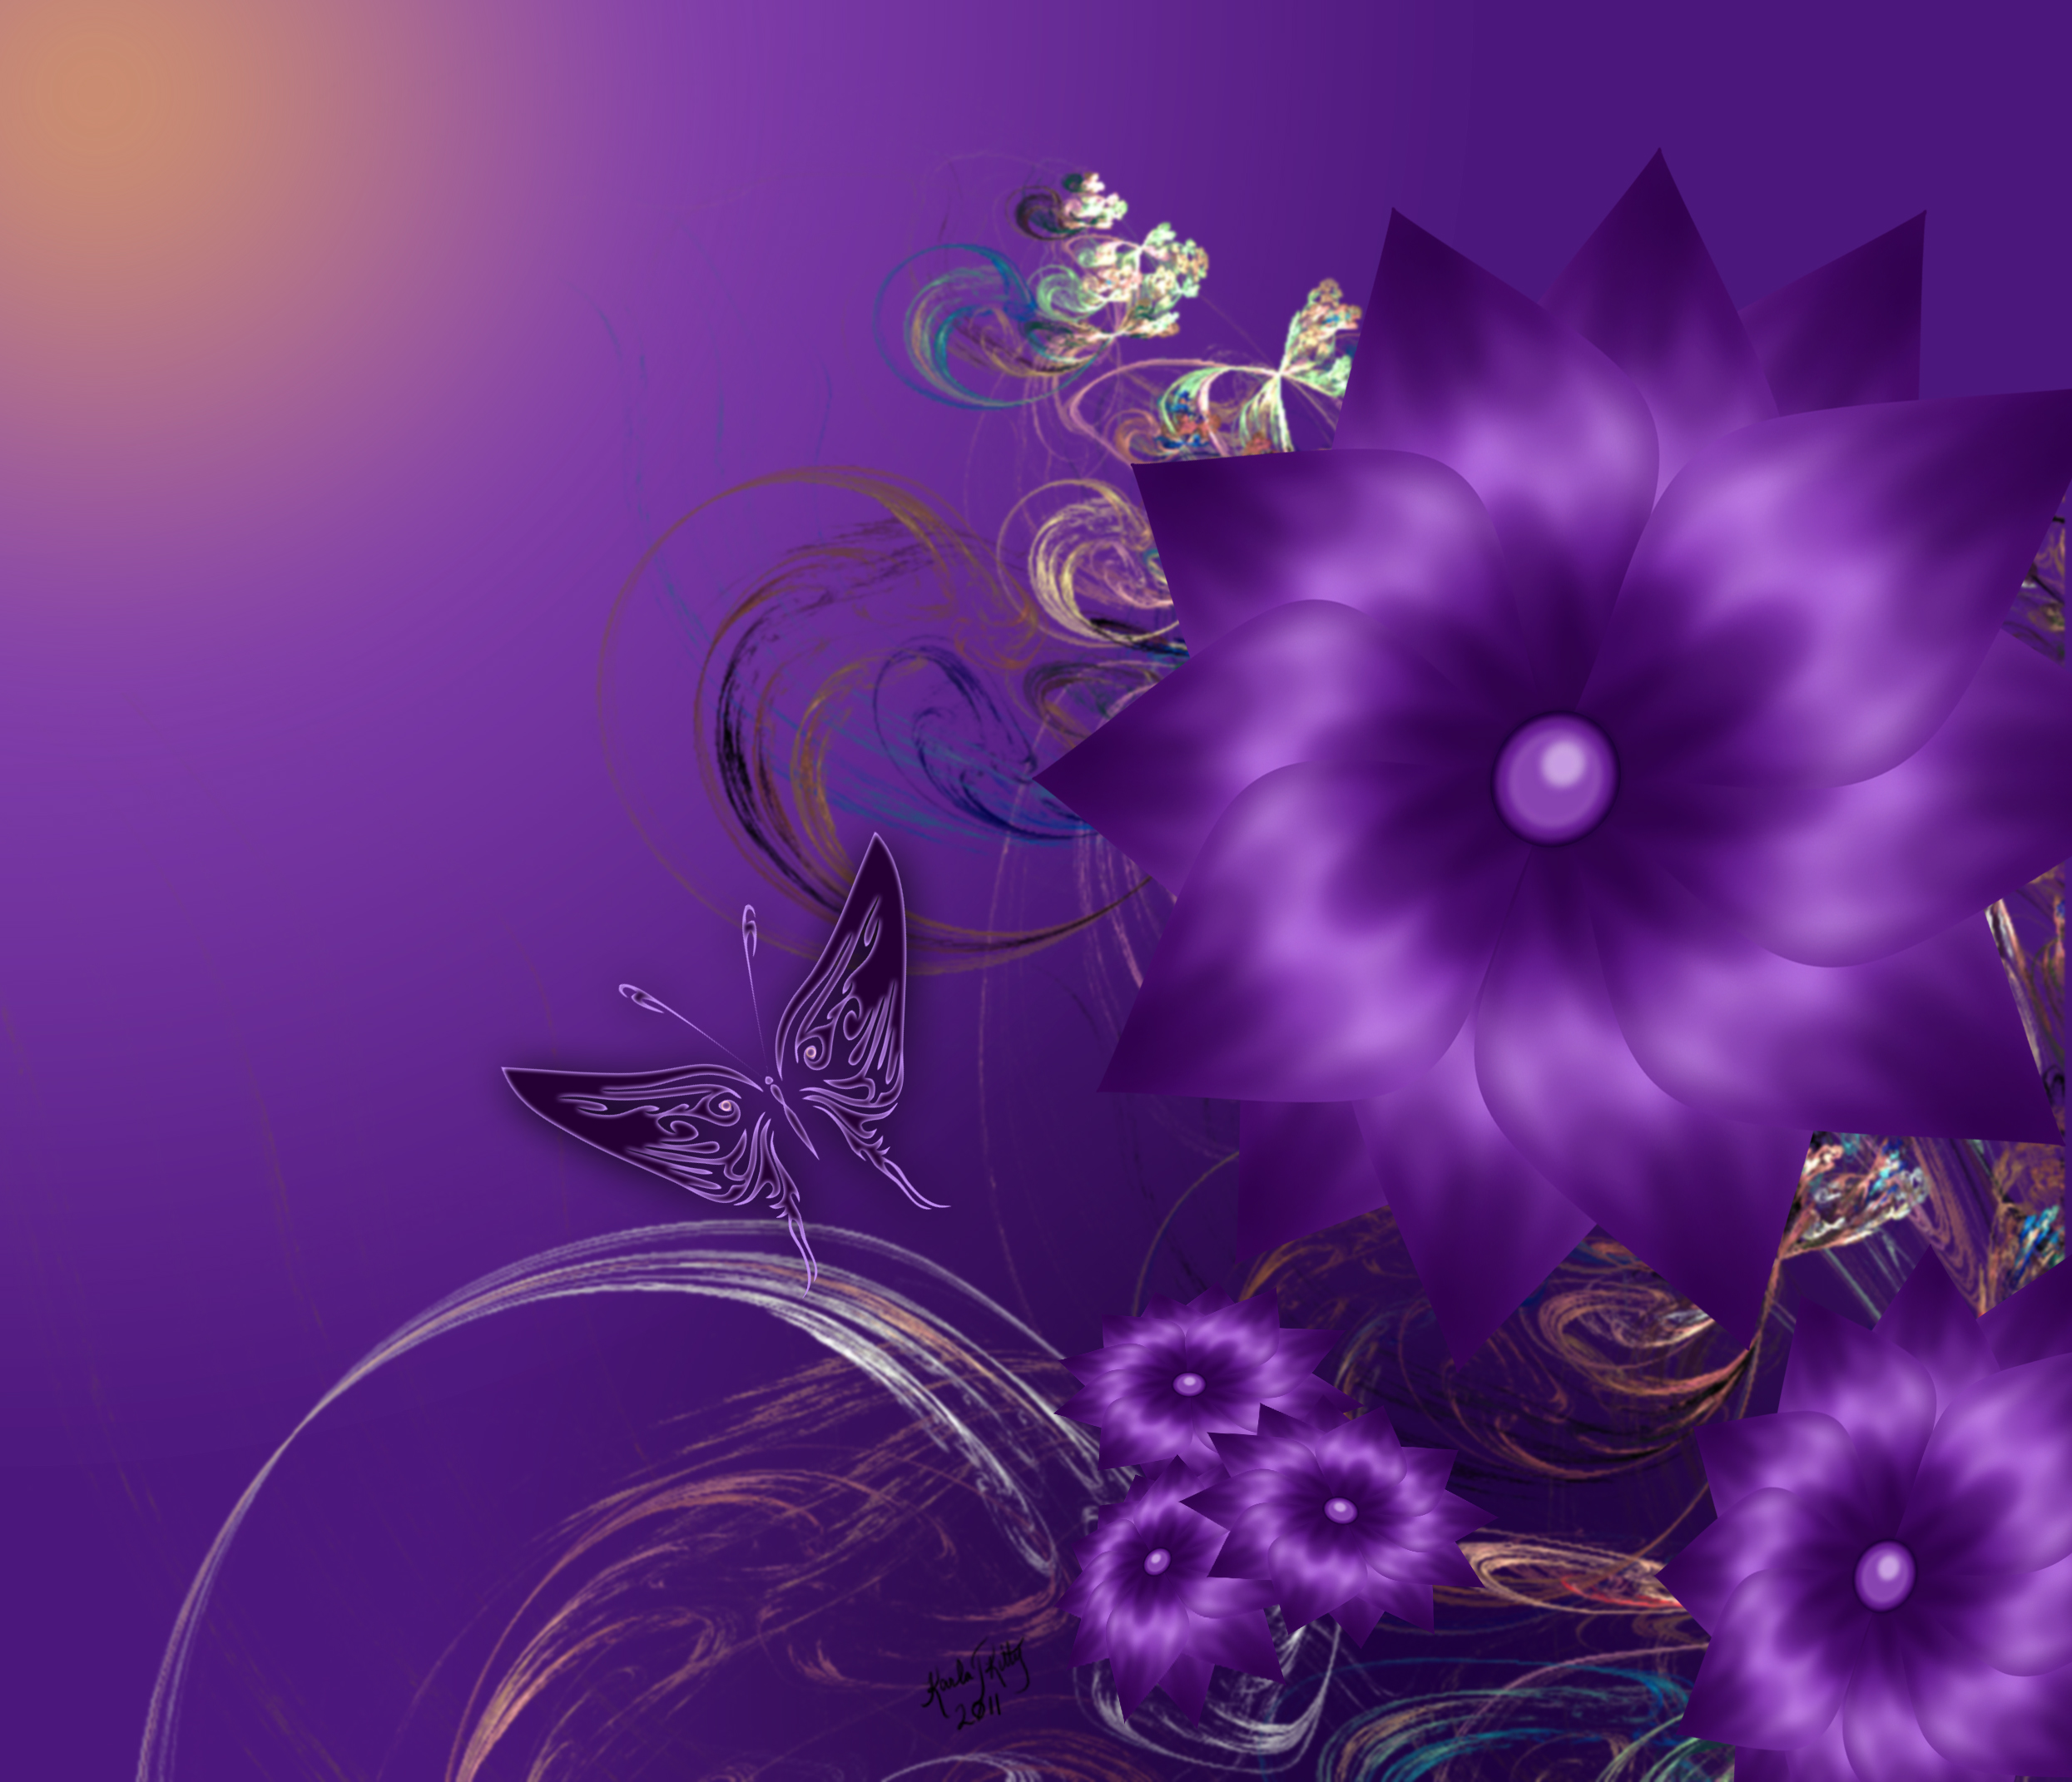 My Purple Day by karlajkitty